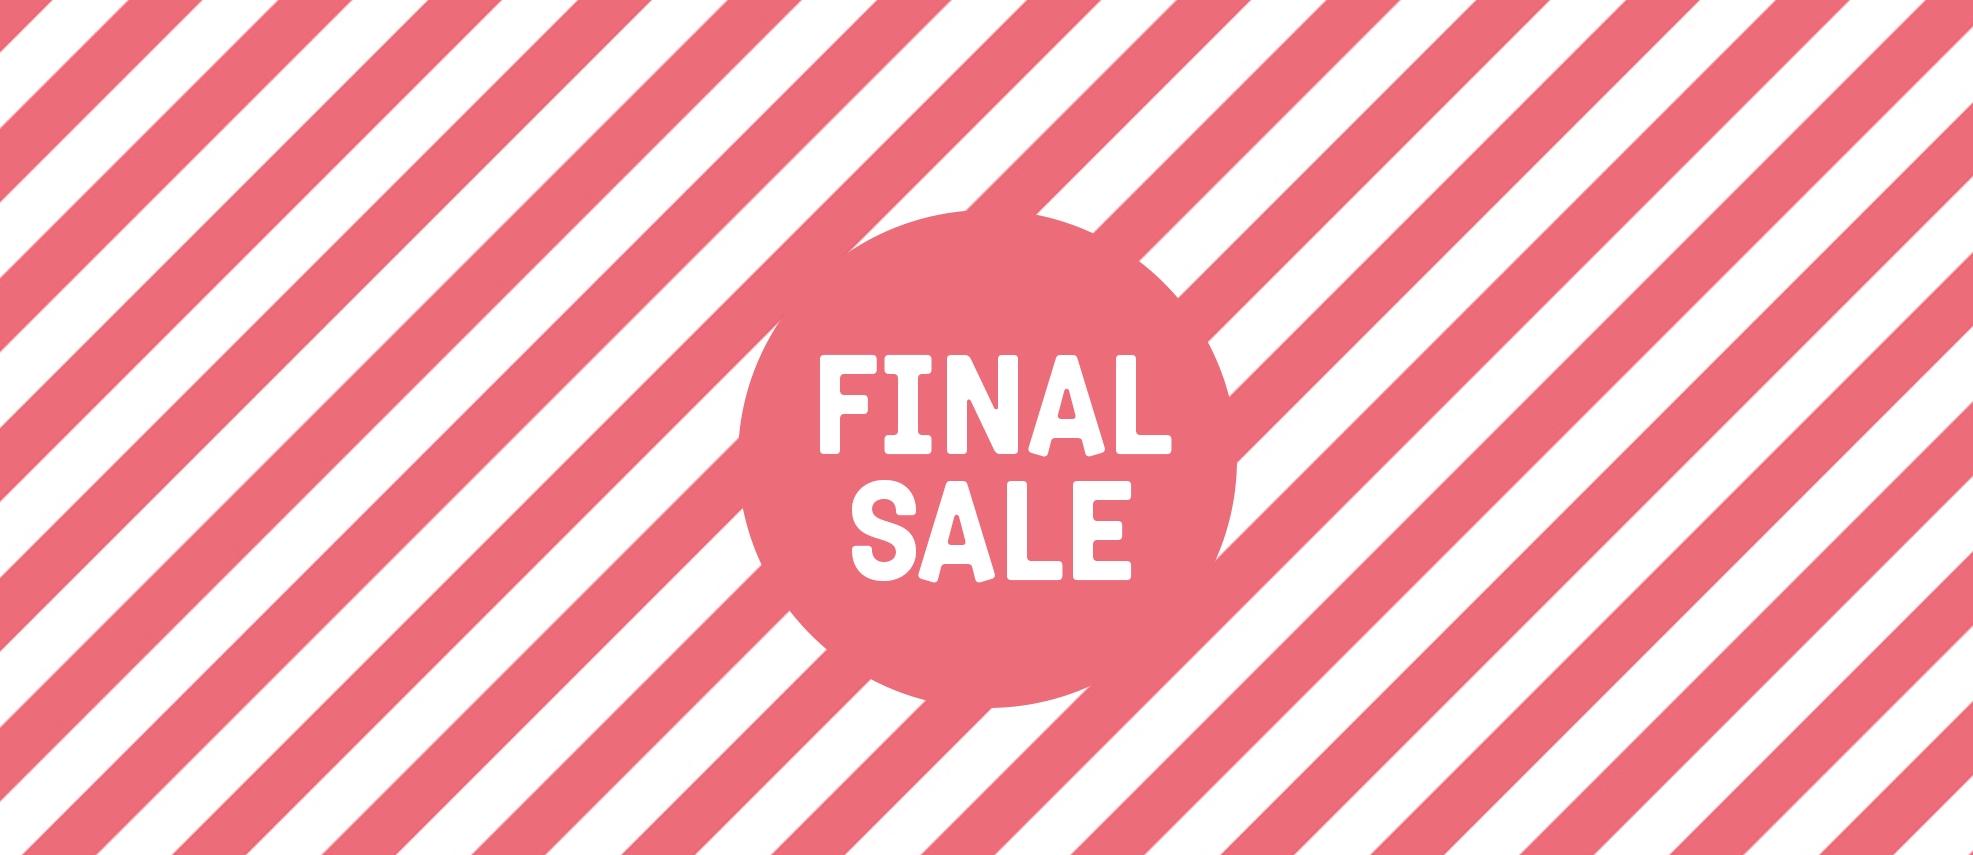 Alles in final sale met 50% korting + gratis verzending door code @ Tumble 'n dry